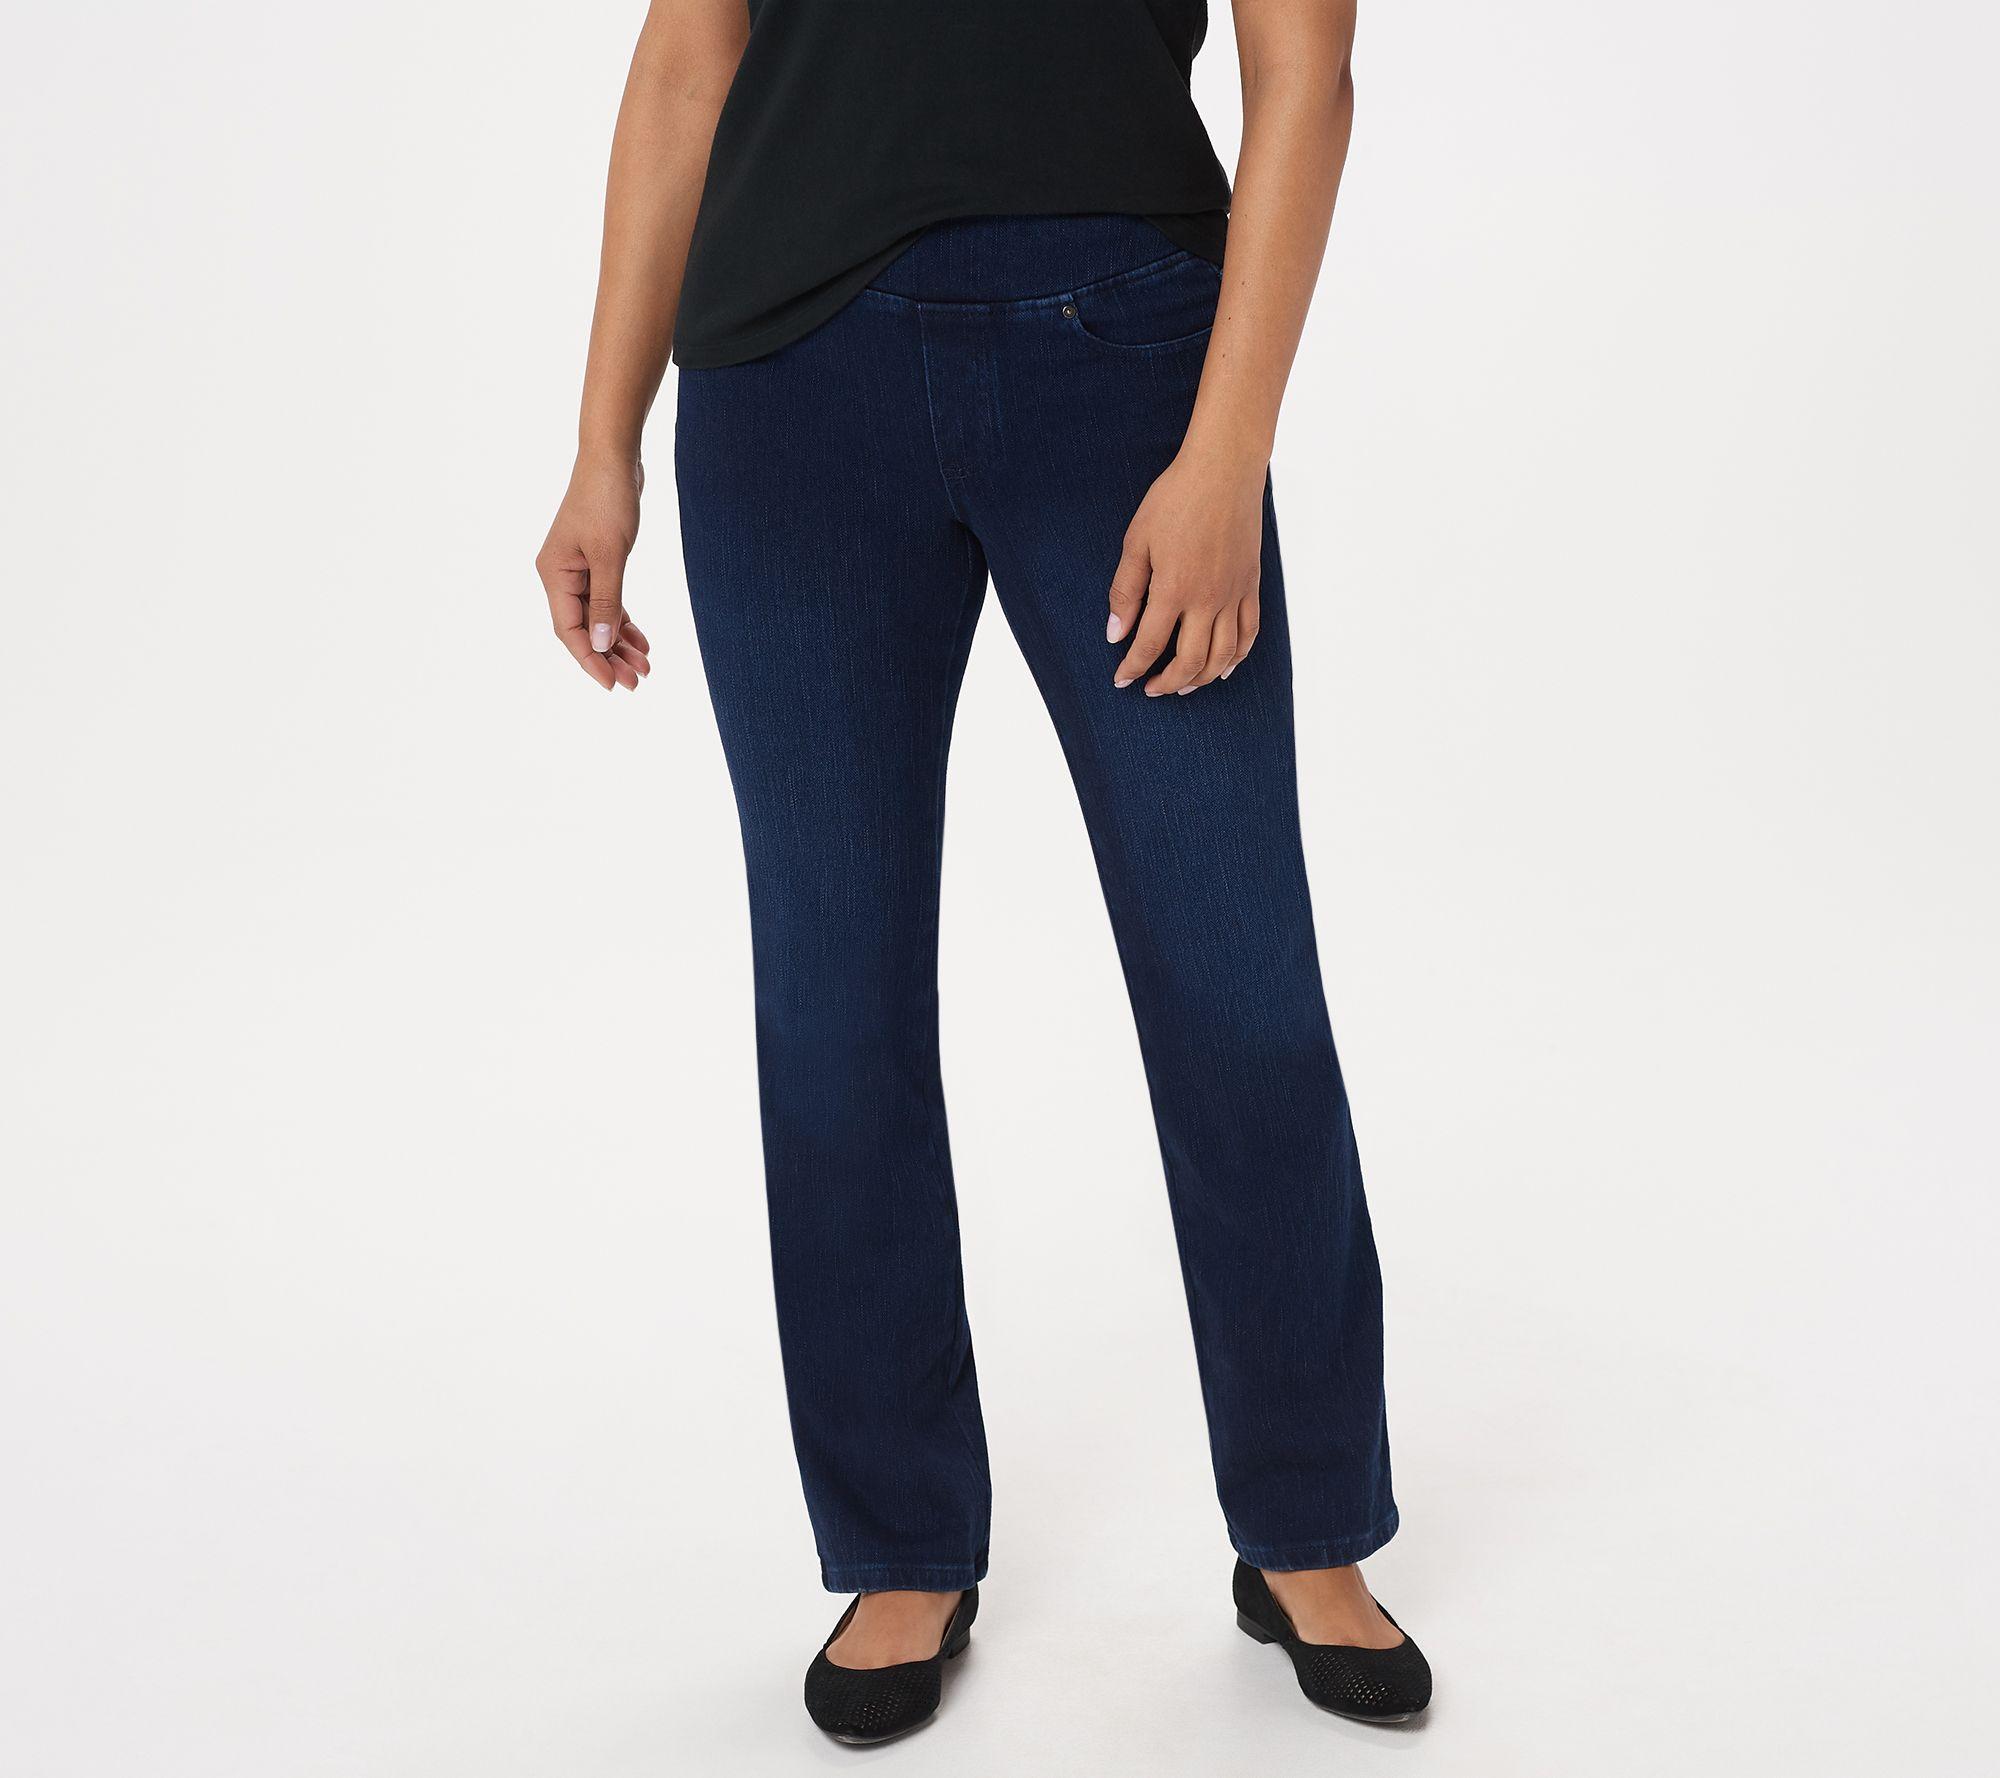 Belle by Kim Gravel Regular Flexibelle Boot-Cut Jeans - A311555